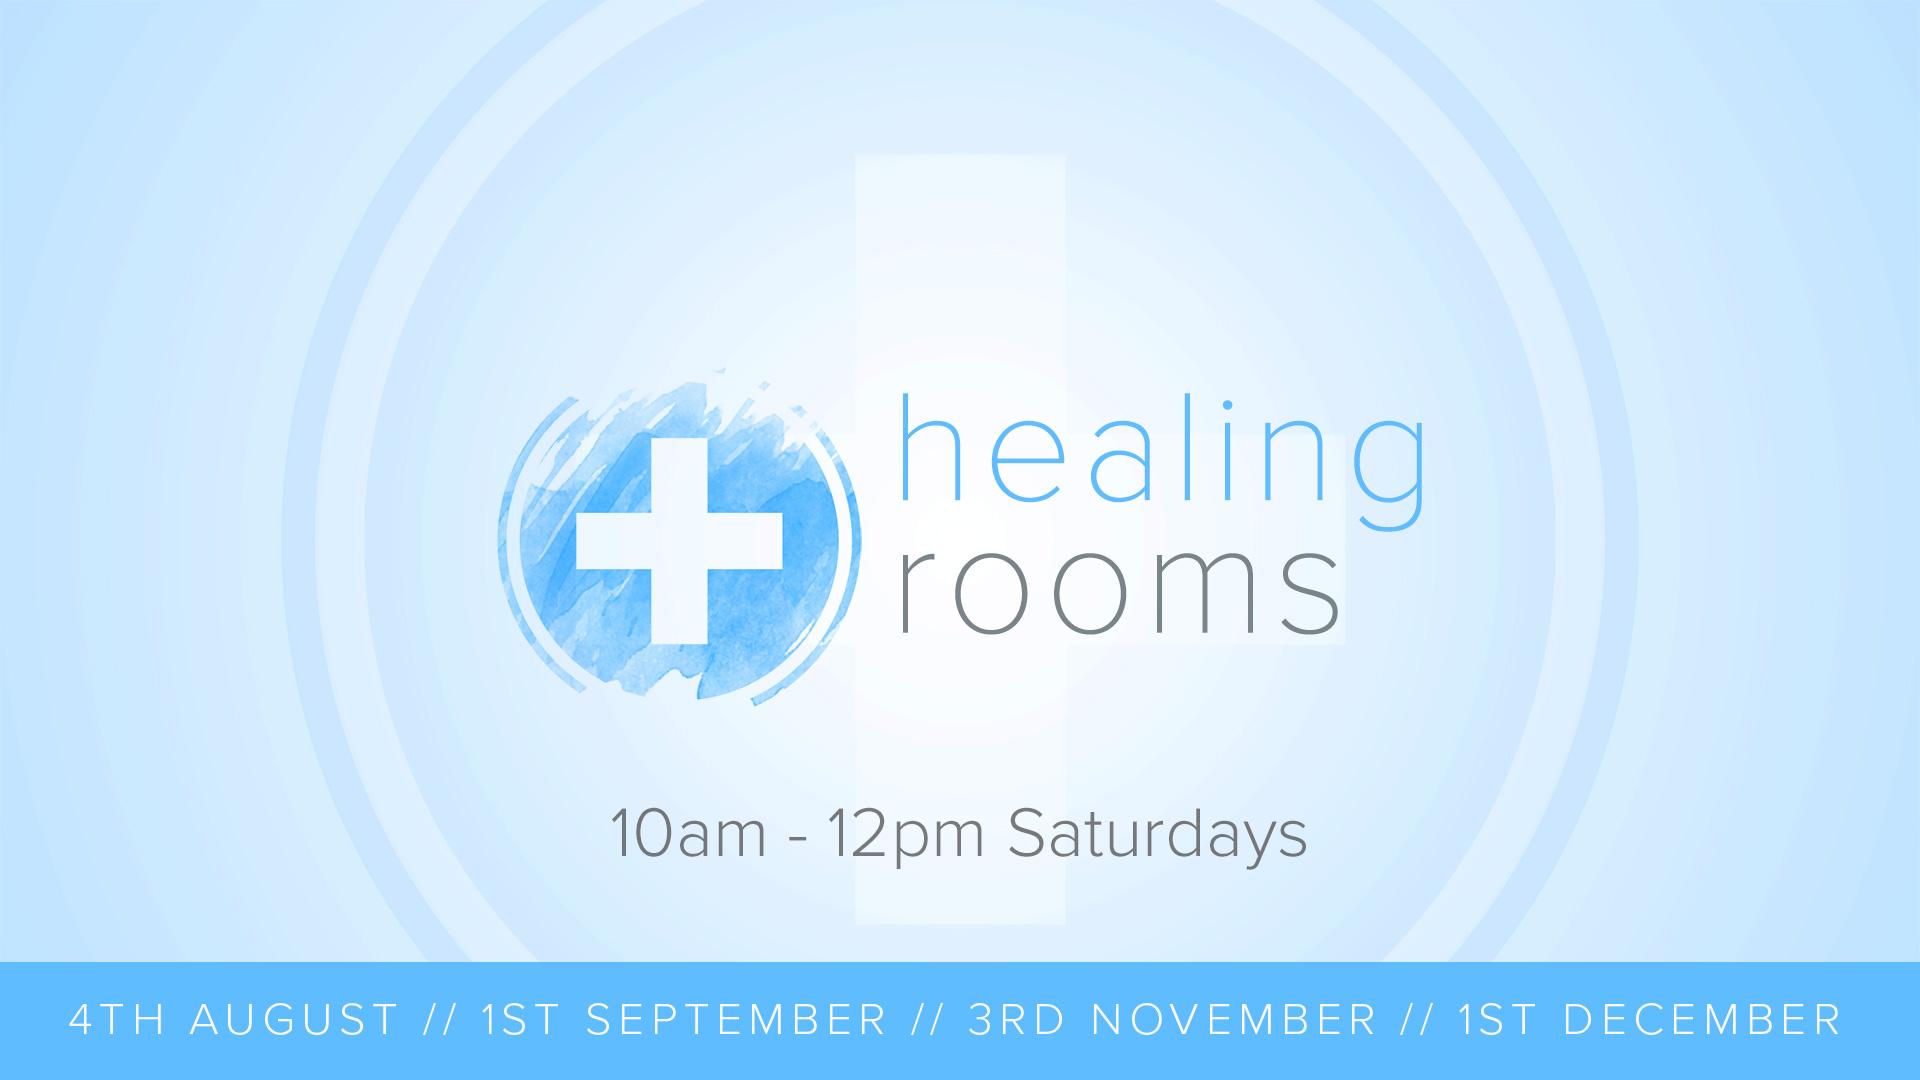 healing-rooms-1920x1080-Aug.jpg